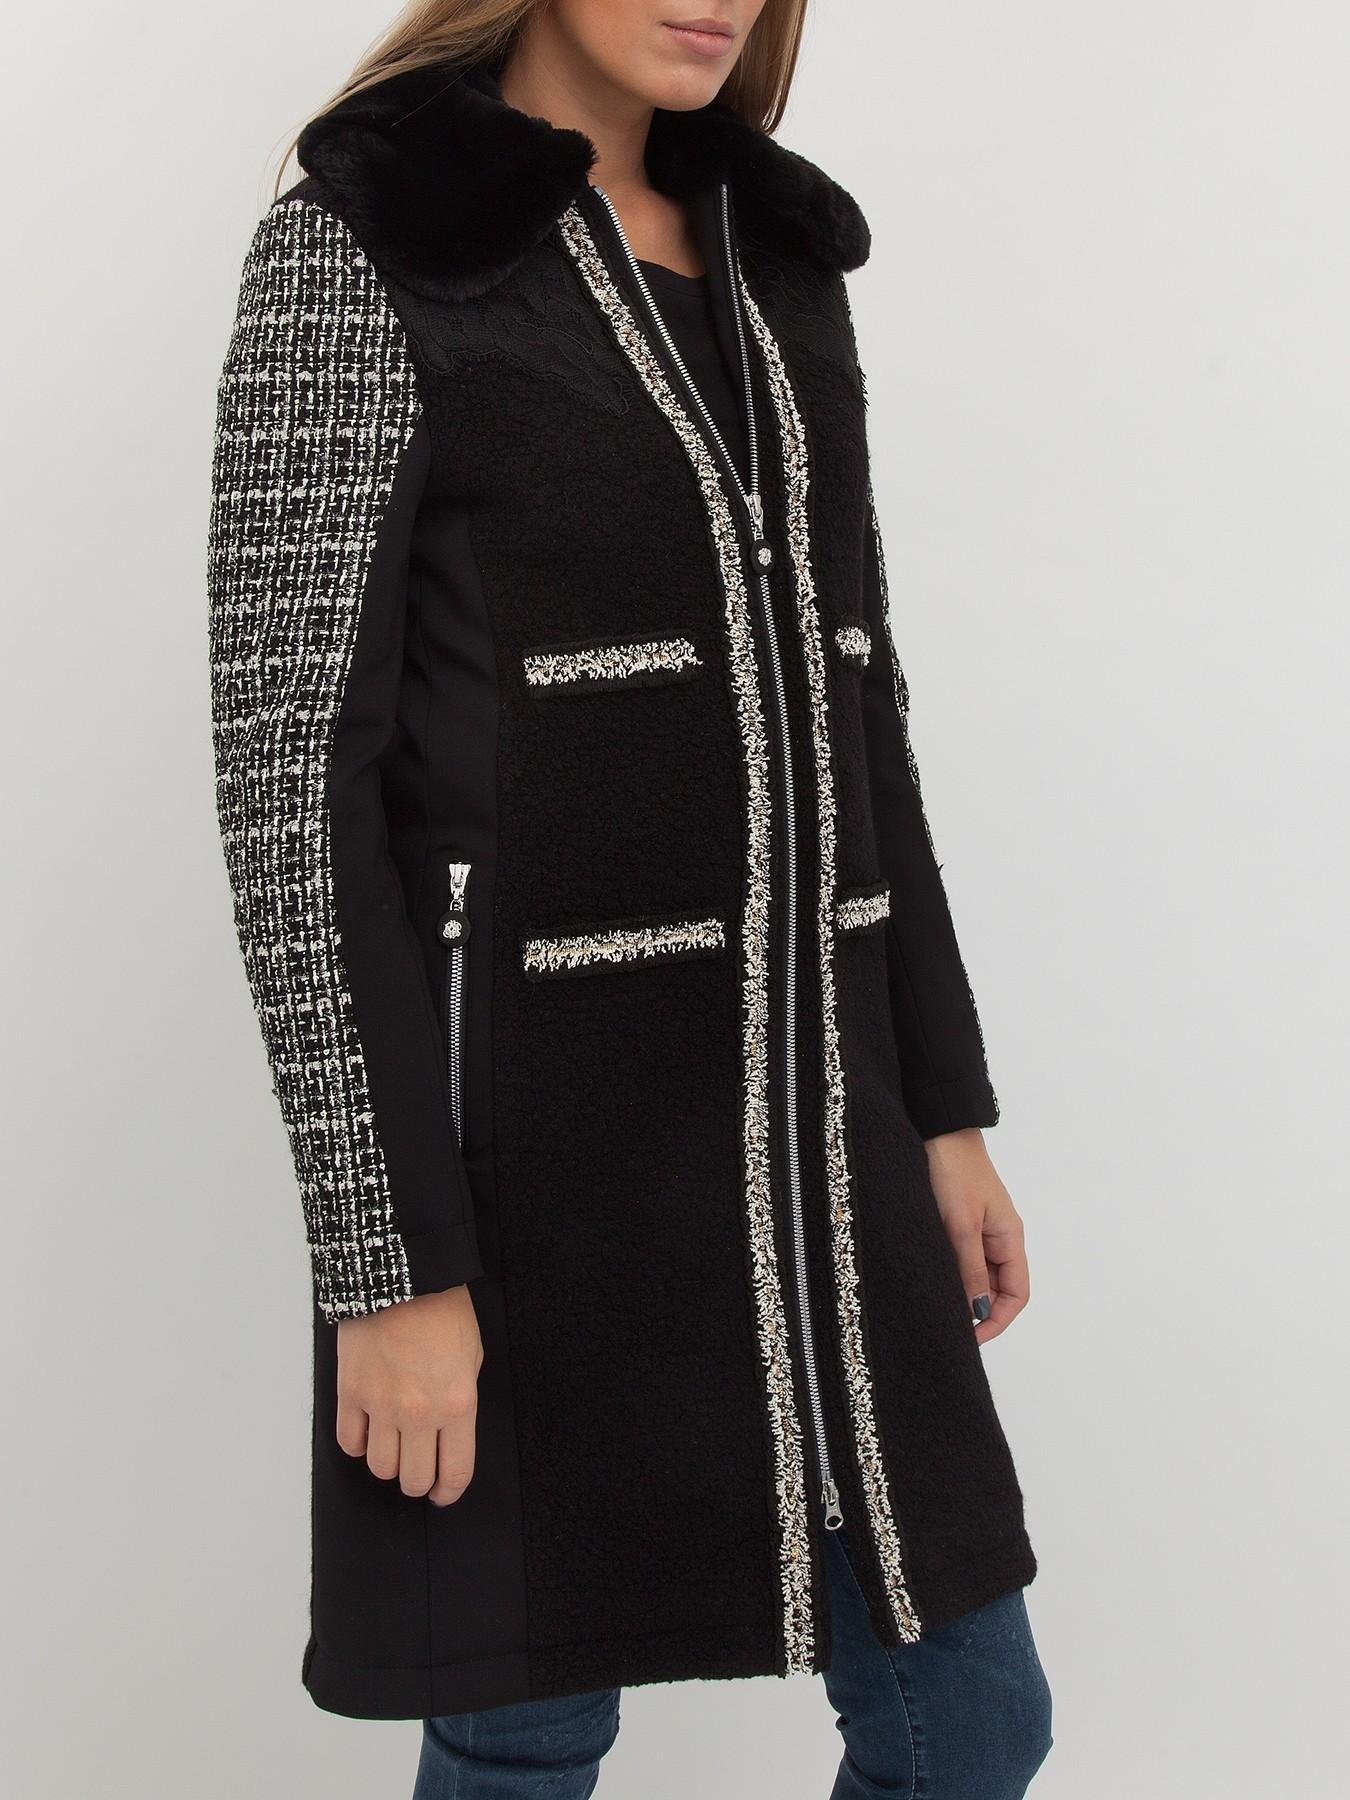 Пальто женское Misam SPORTALM sportgrad.ru 42f12048d77